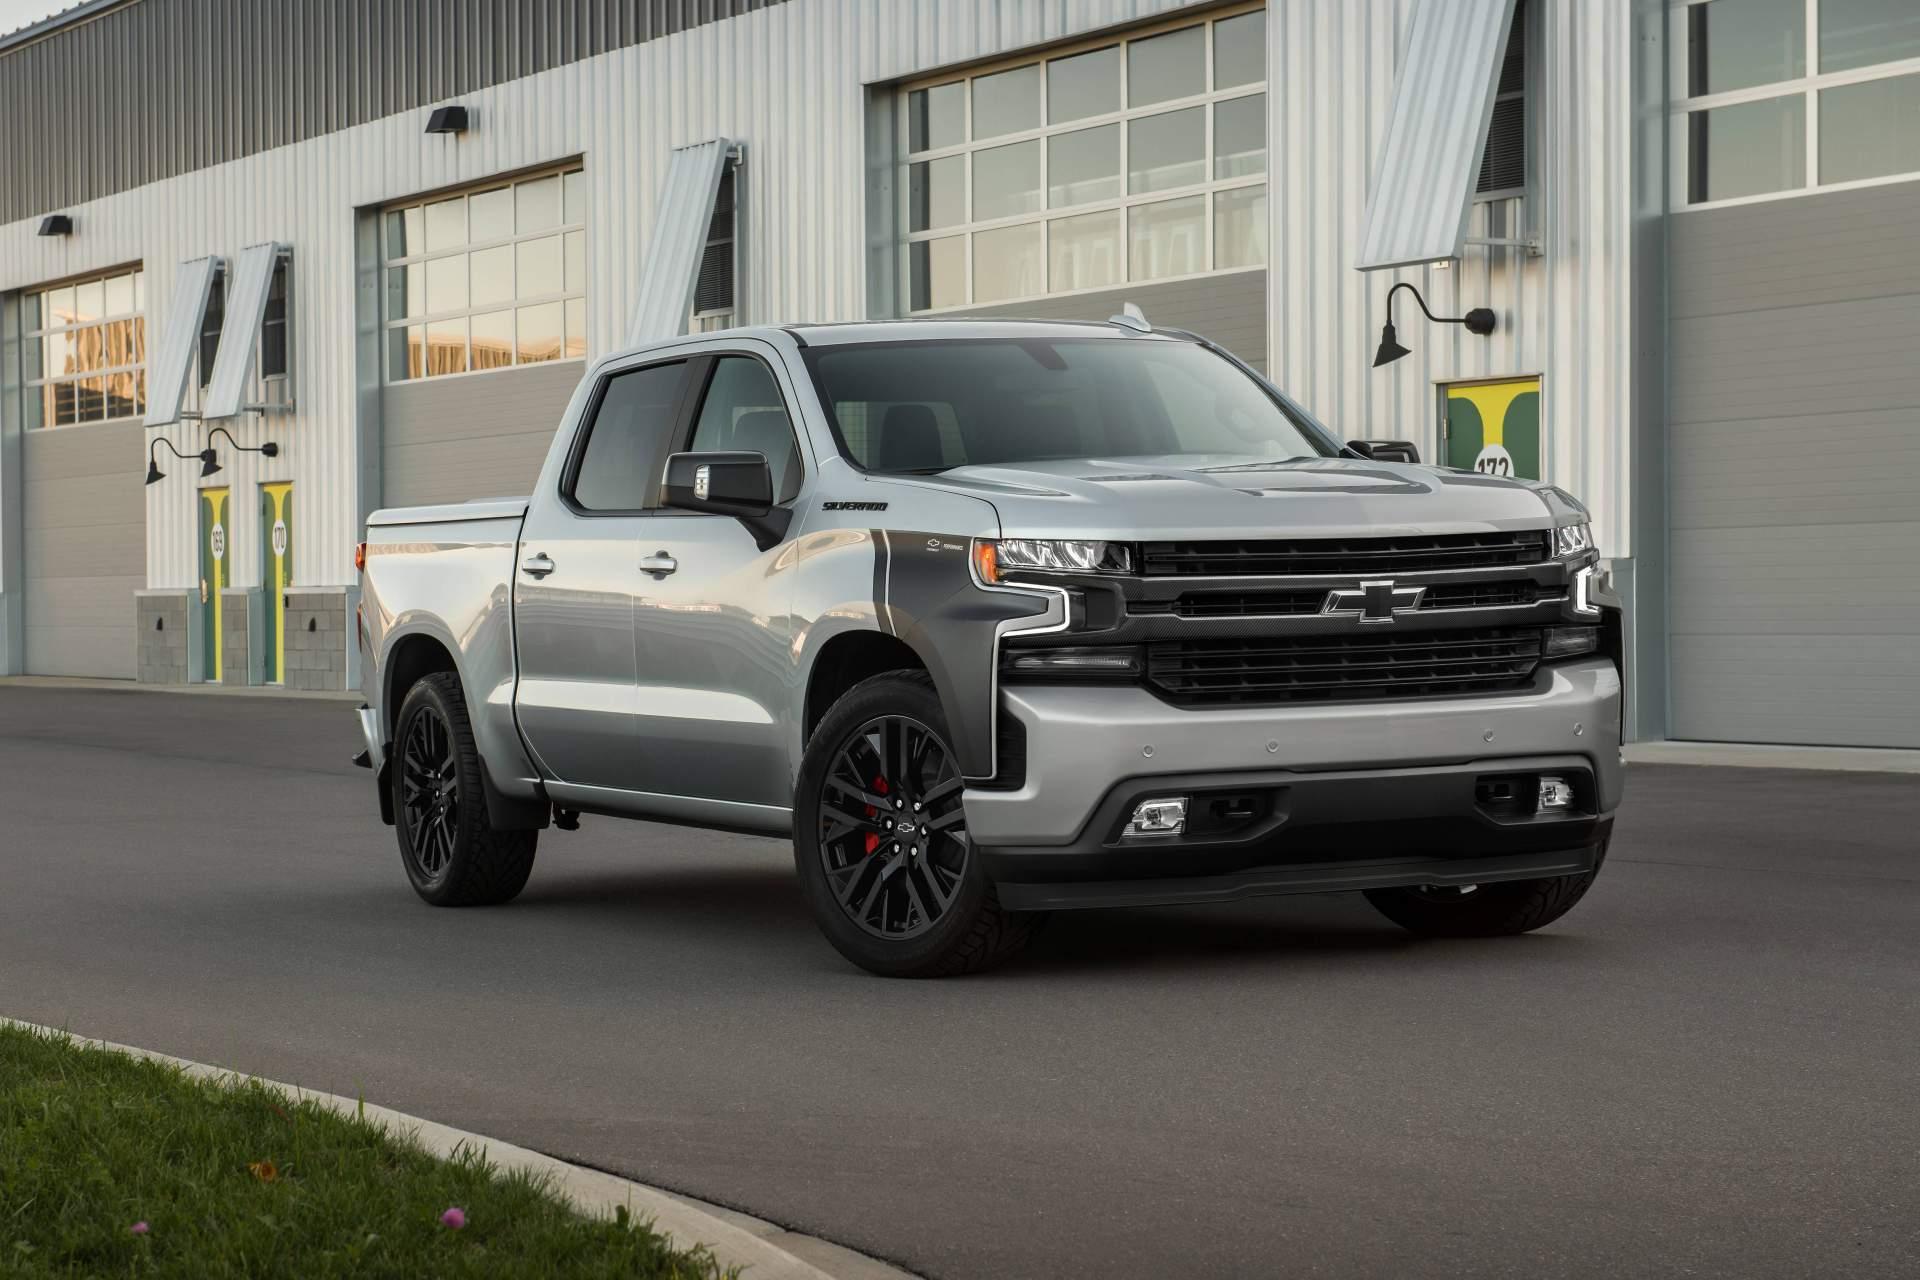 Cold Air Intake For Chevy Silverado 1500 >> Chevrolet Tunes Four 2019 Silverado 1500 Models, Calls Them Concepts - autoevolution